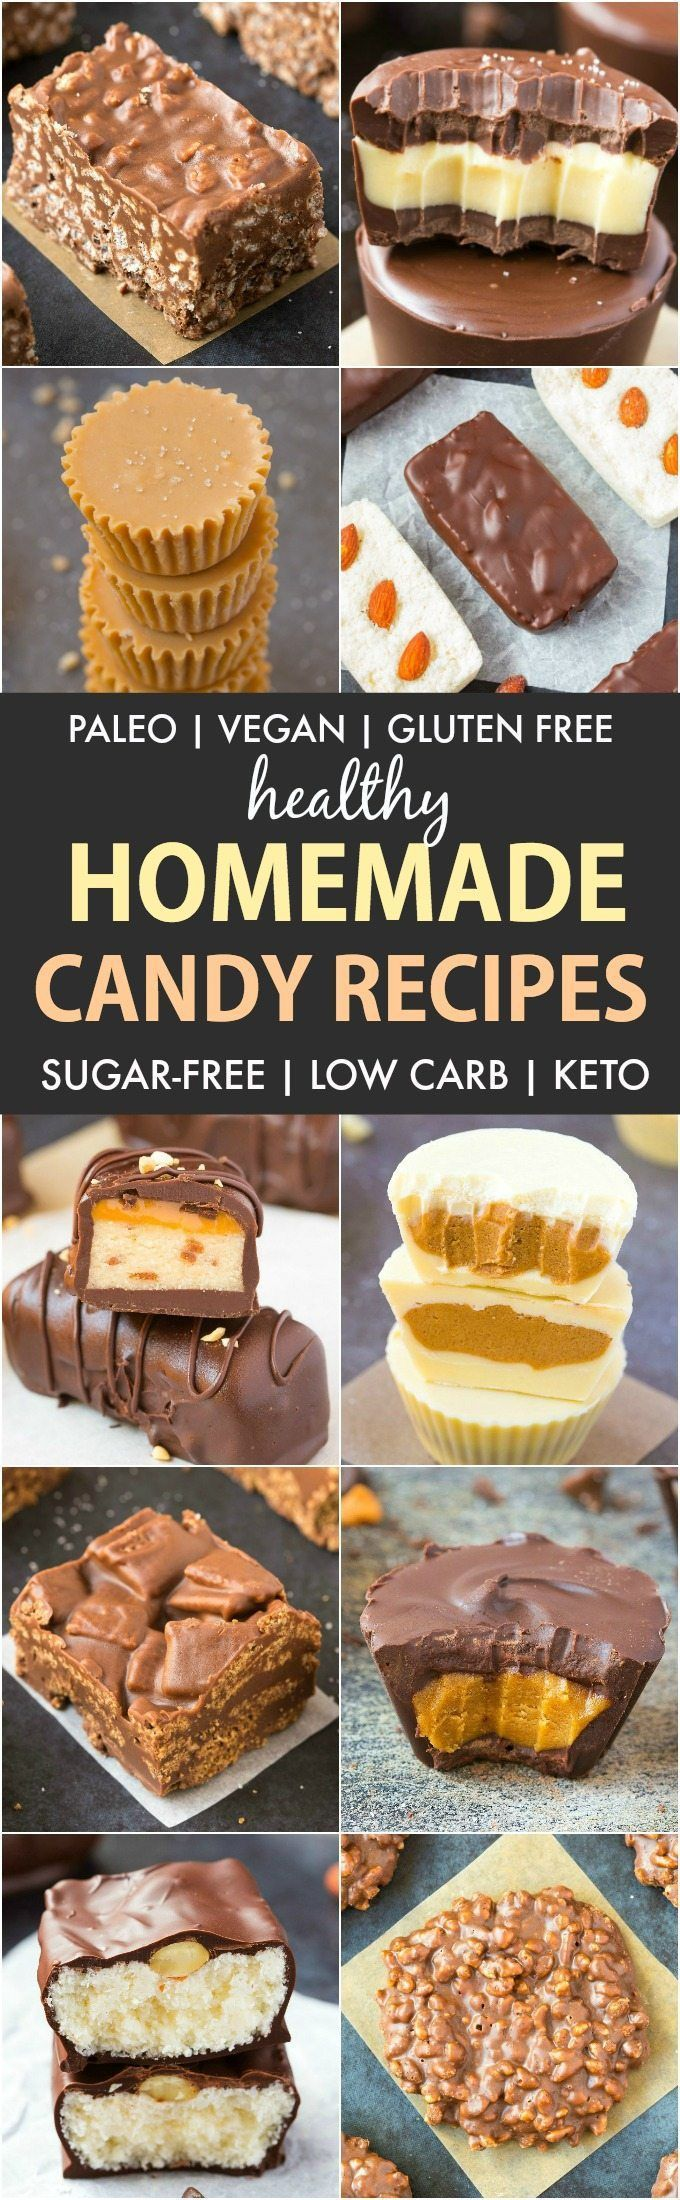 20 Healthy Homemade Candy Recipes (Paleo, Vegan, Gluten Free)